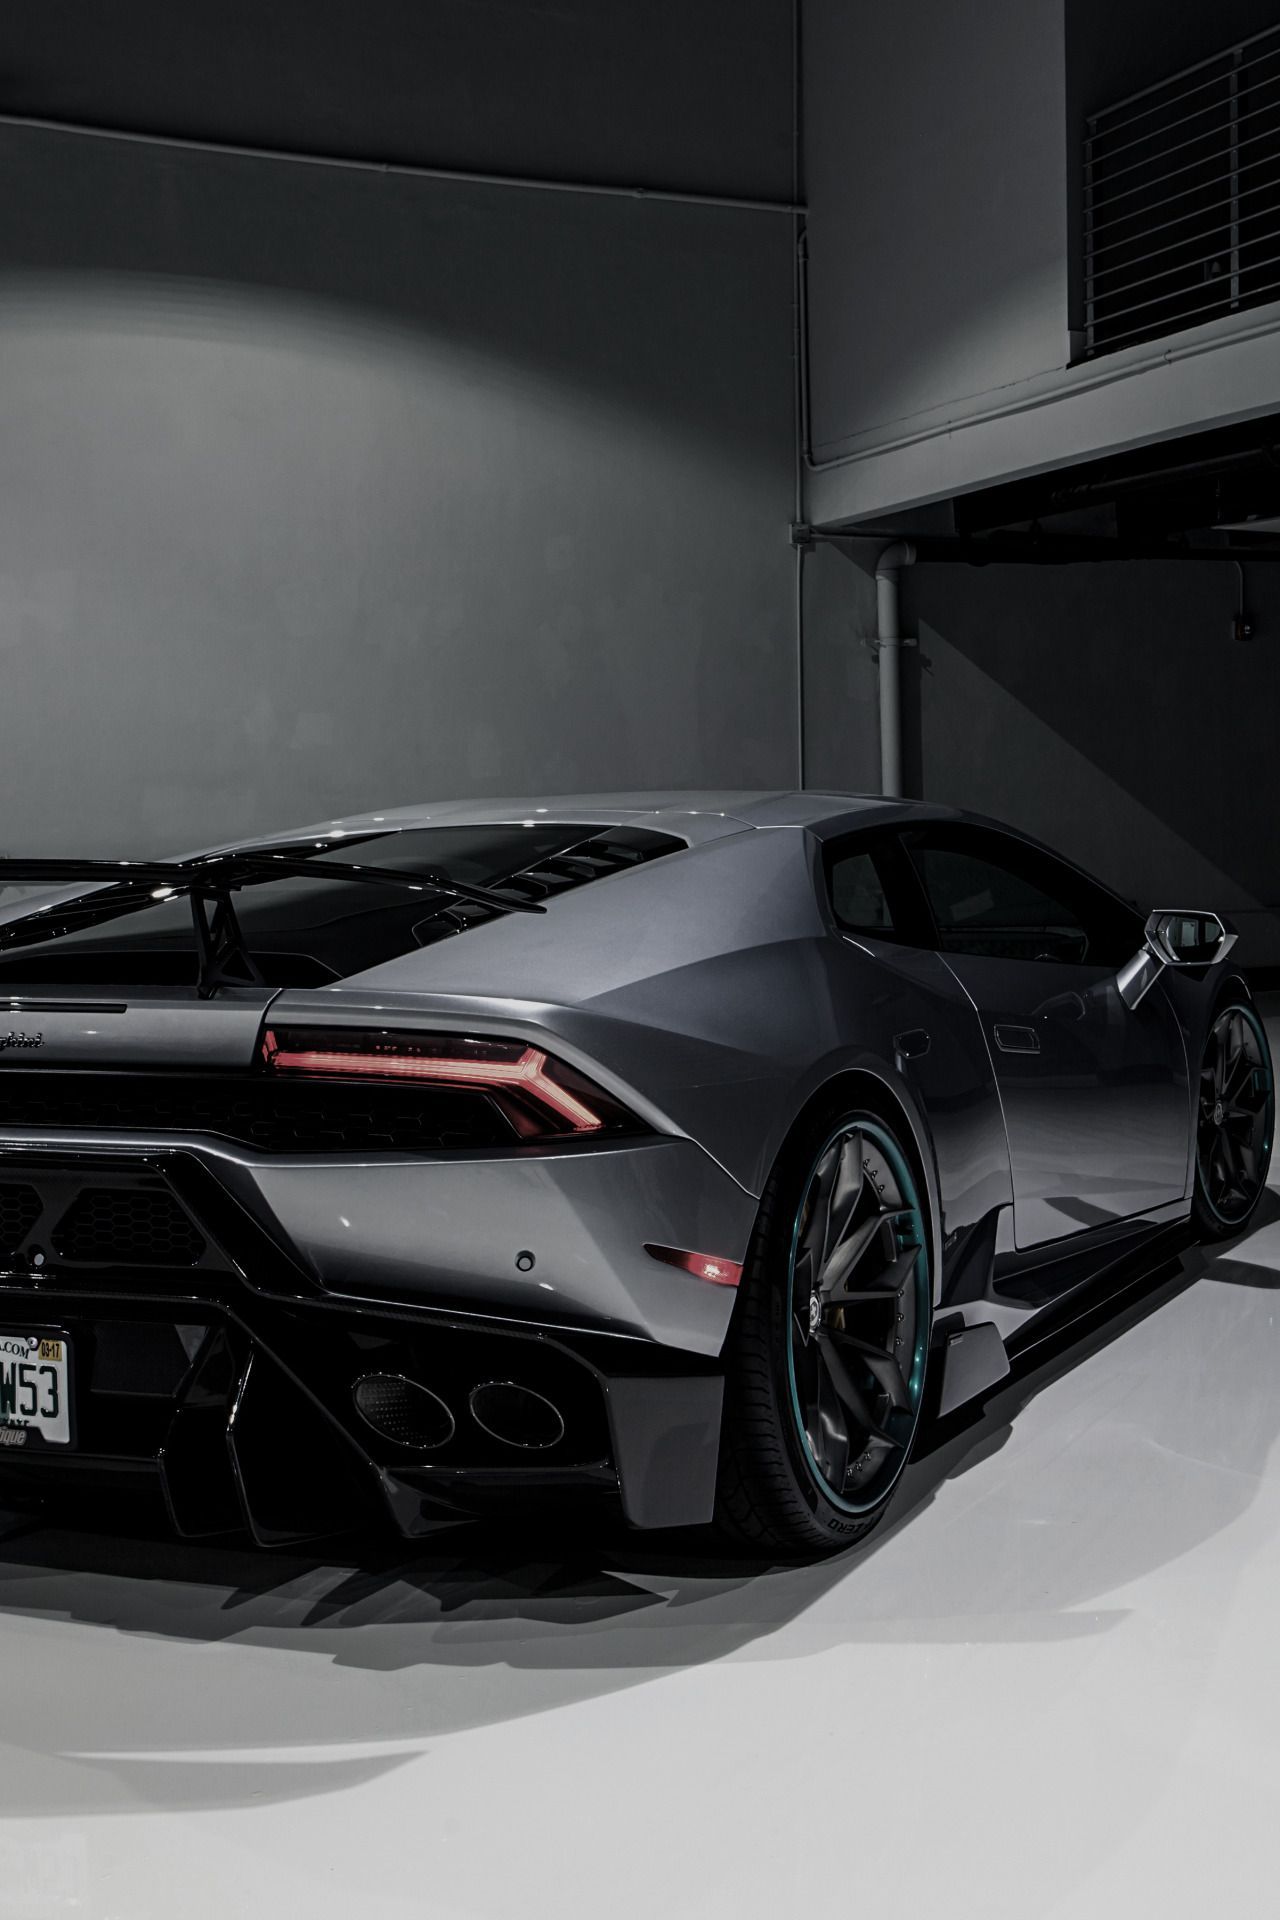 ef60f2e7d4b9bf5d4b261d3599b44424 Marvelous Lamborghini Huracan Price In Uae Cars Trend